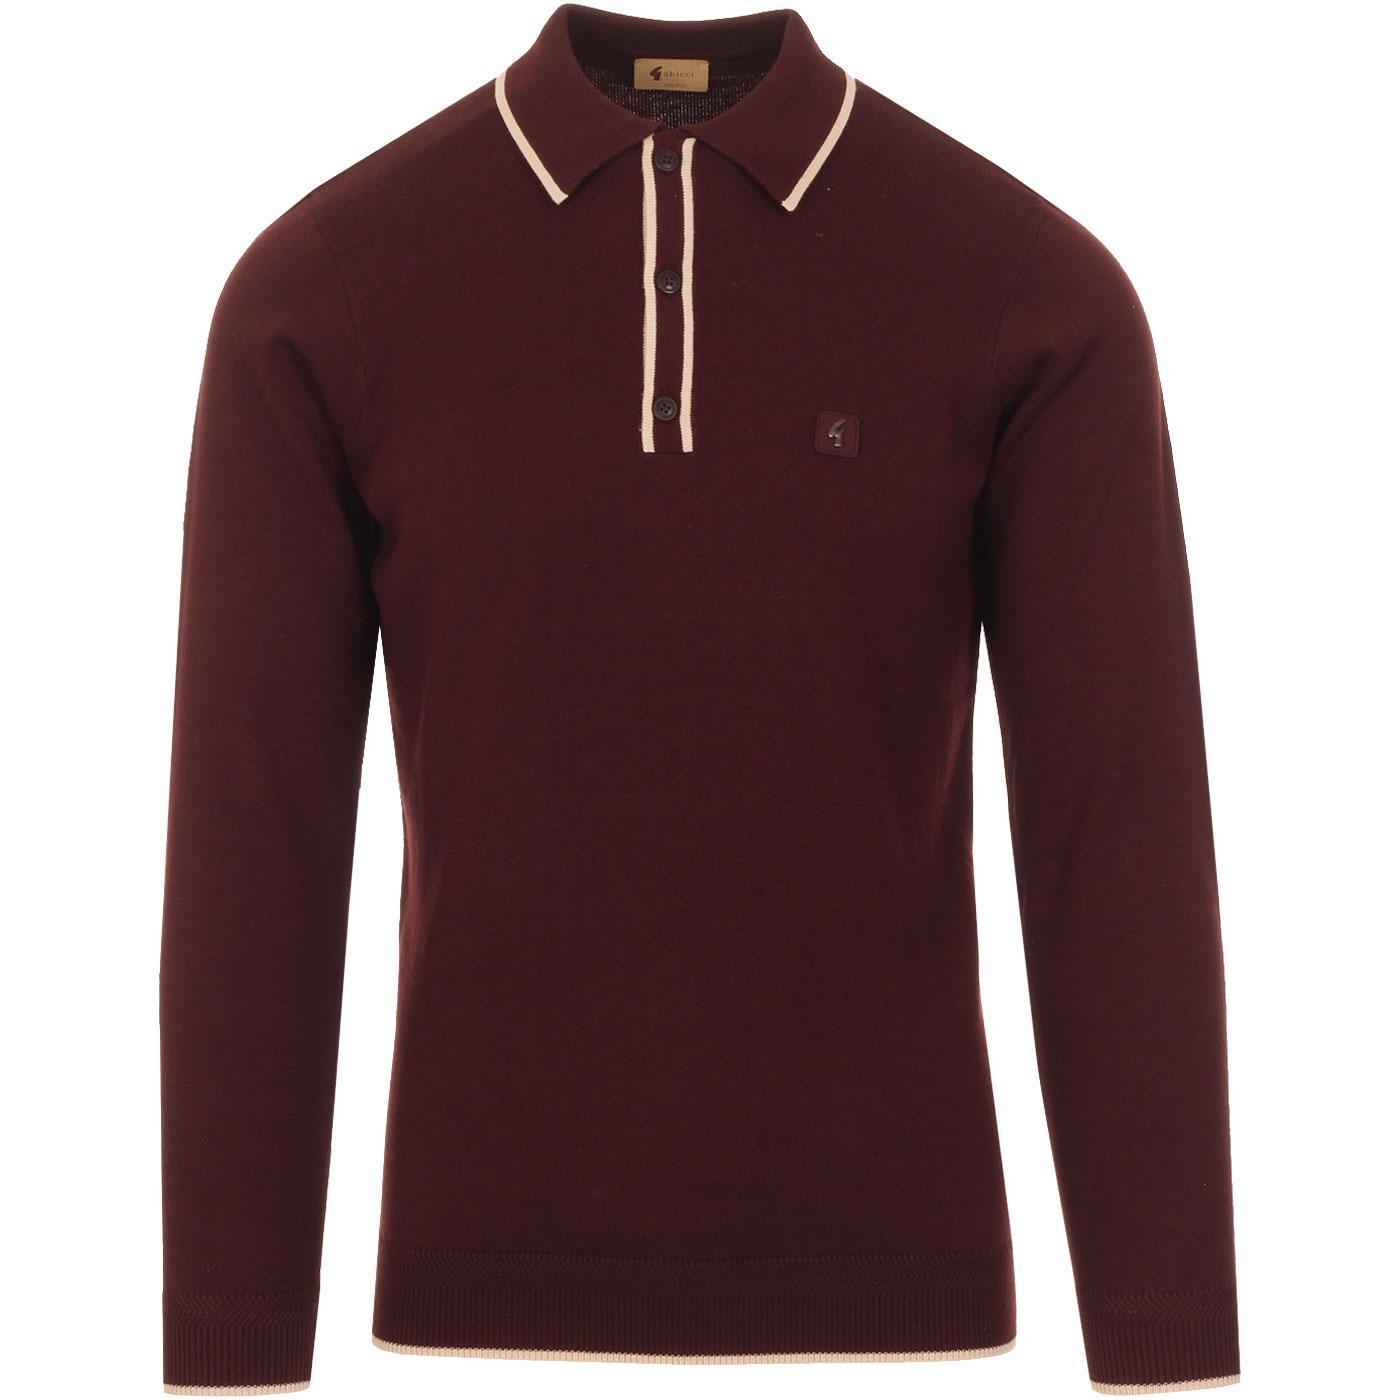 Lineker GABICCI VINTAGE Mod Tipped Knitted Polo O